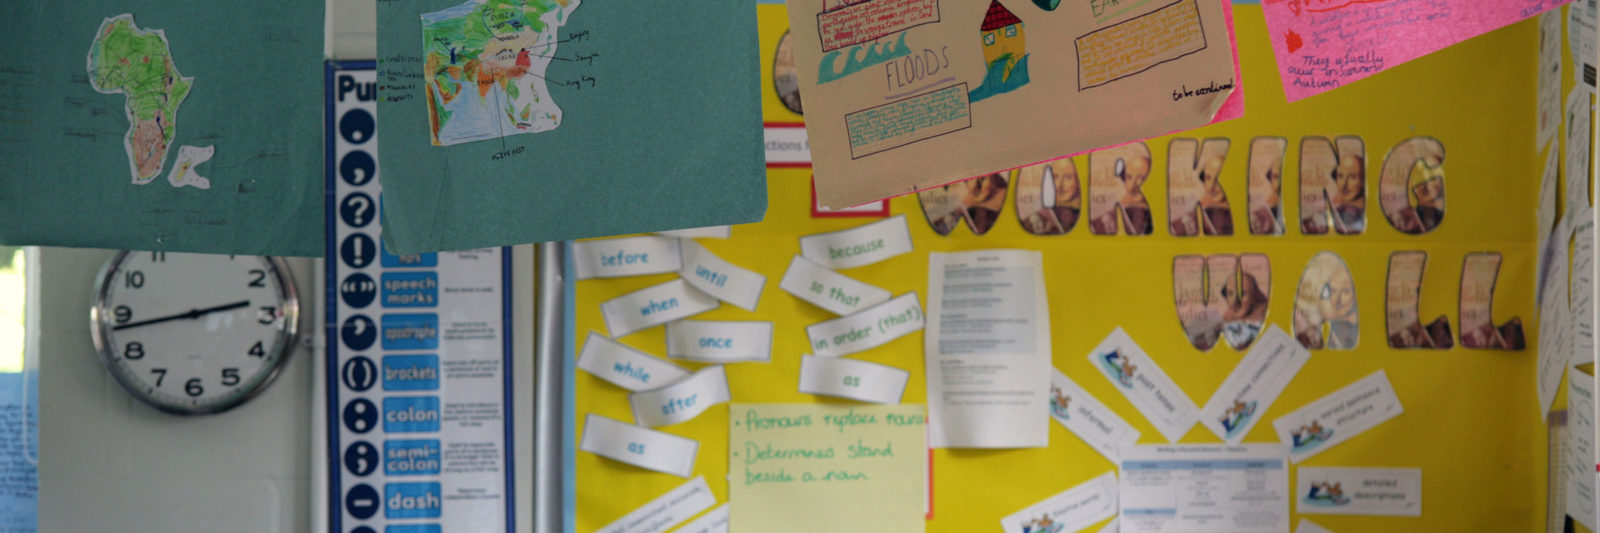 Children's work in the classroom